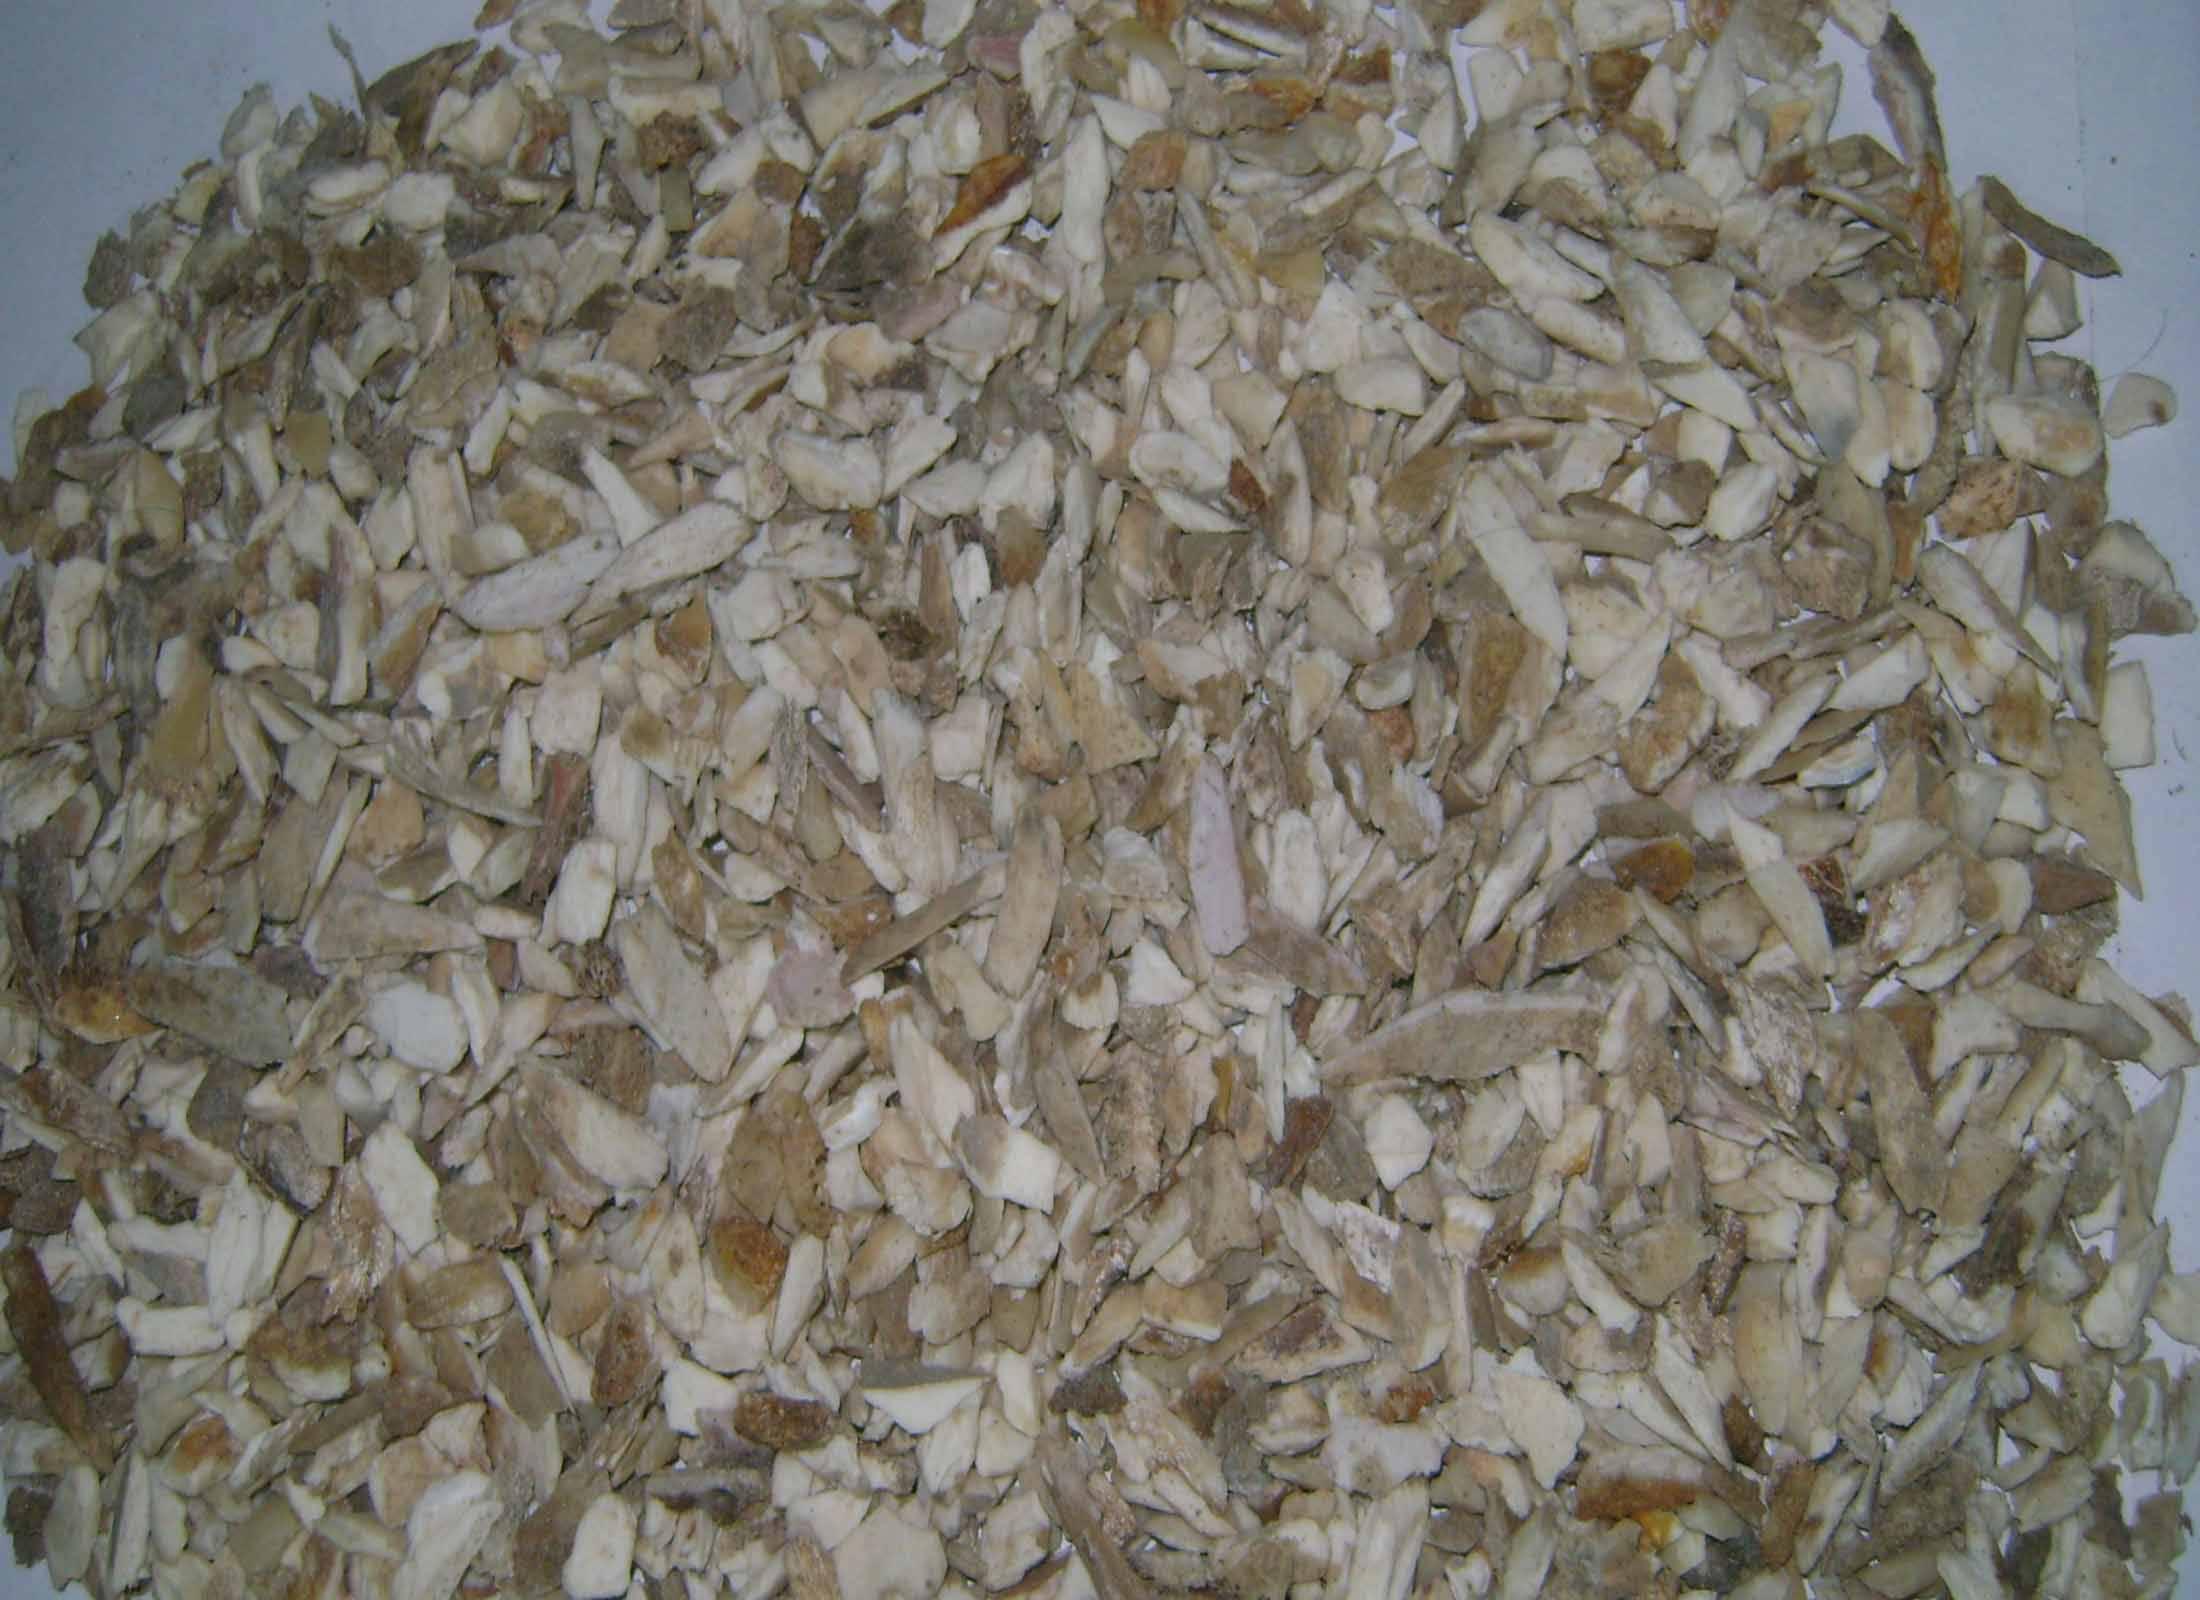 Crushed Bone Sales from Bangladesh